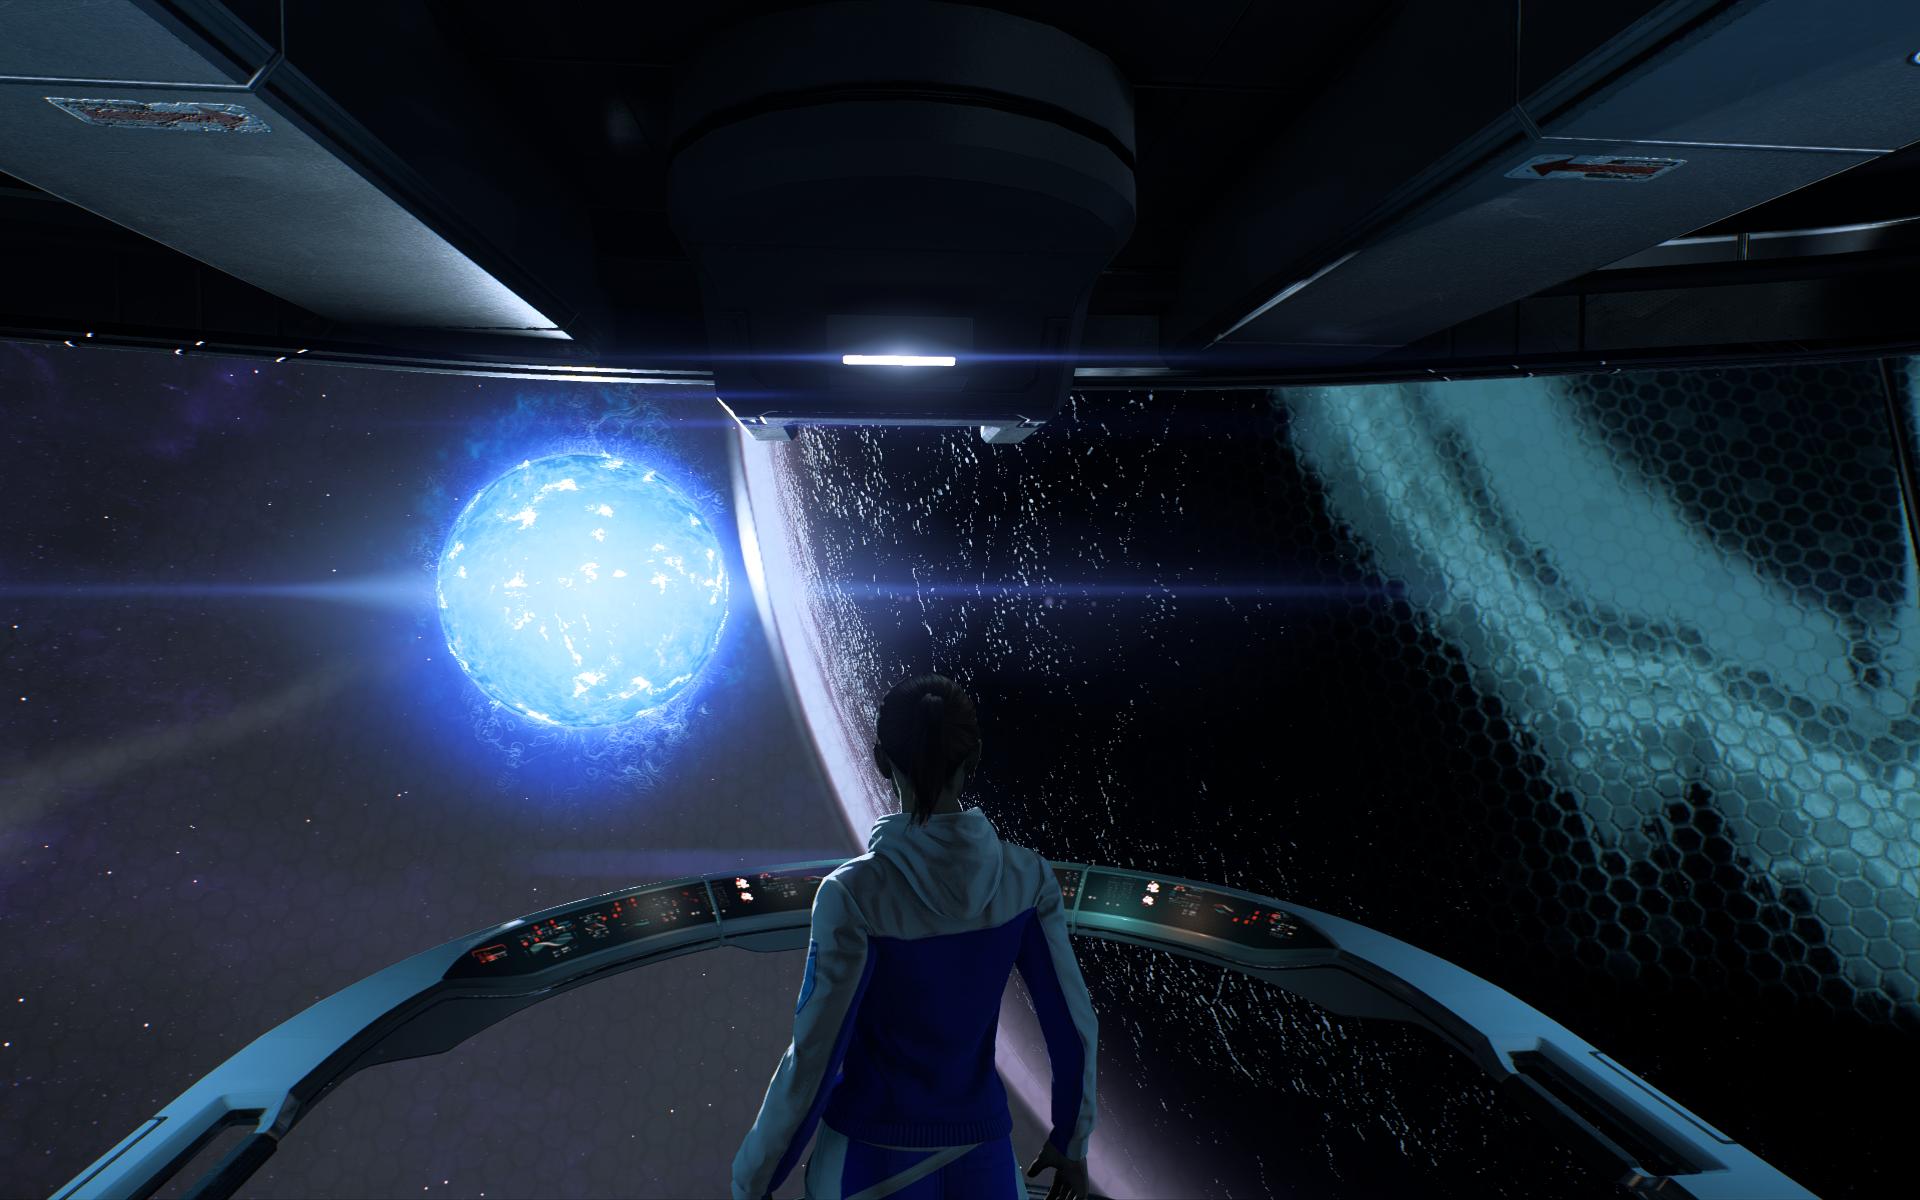 Mass Effect Andromeda Screenshot  - 05.12.45.86.png - Mass Effect: Andromeda